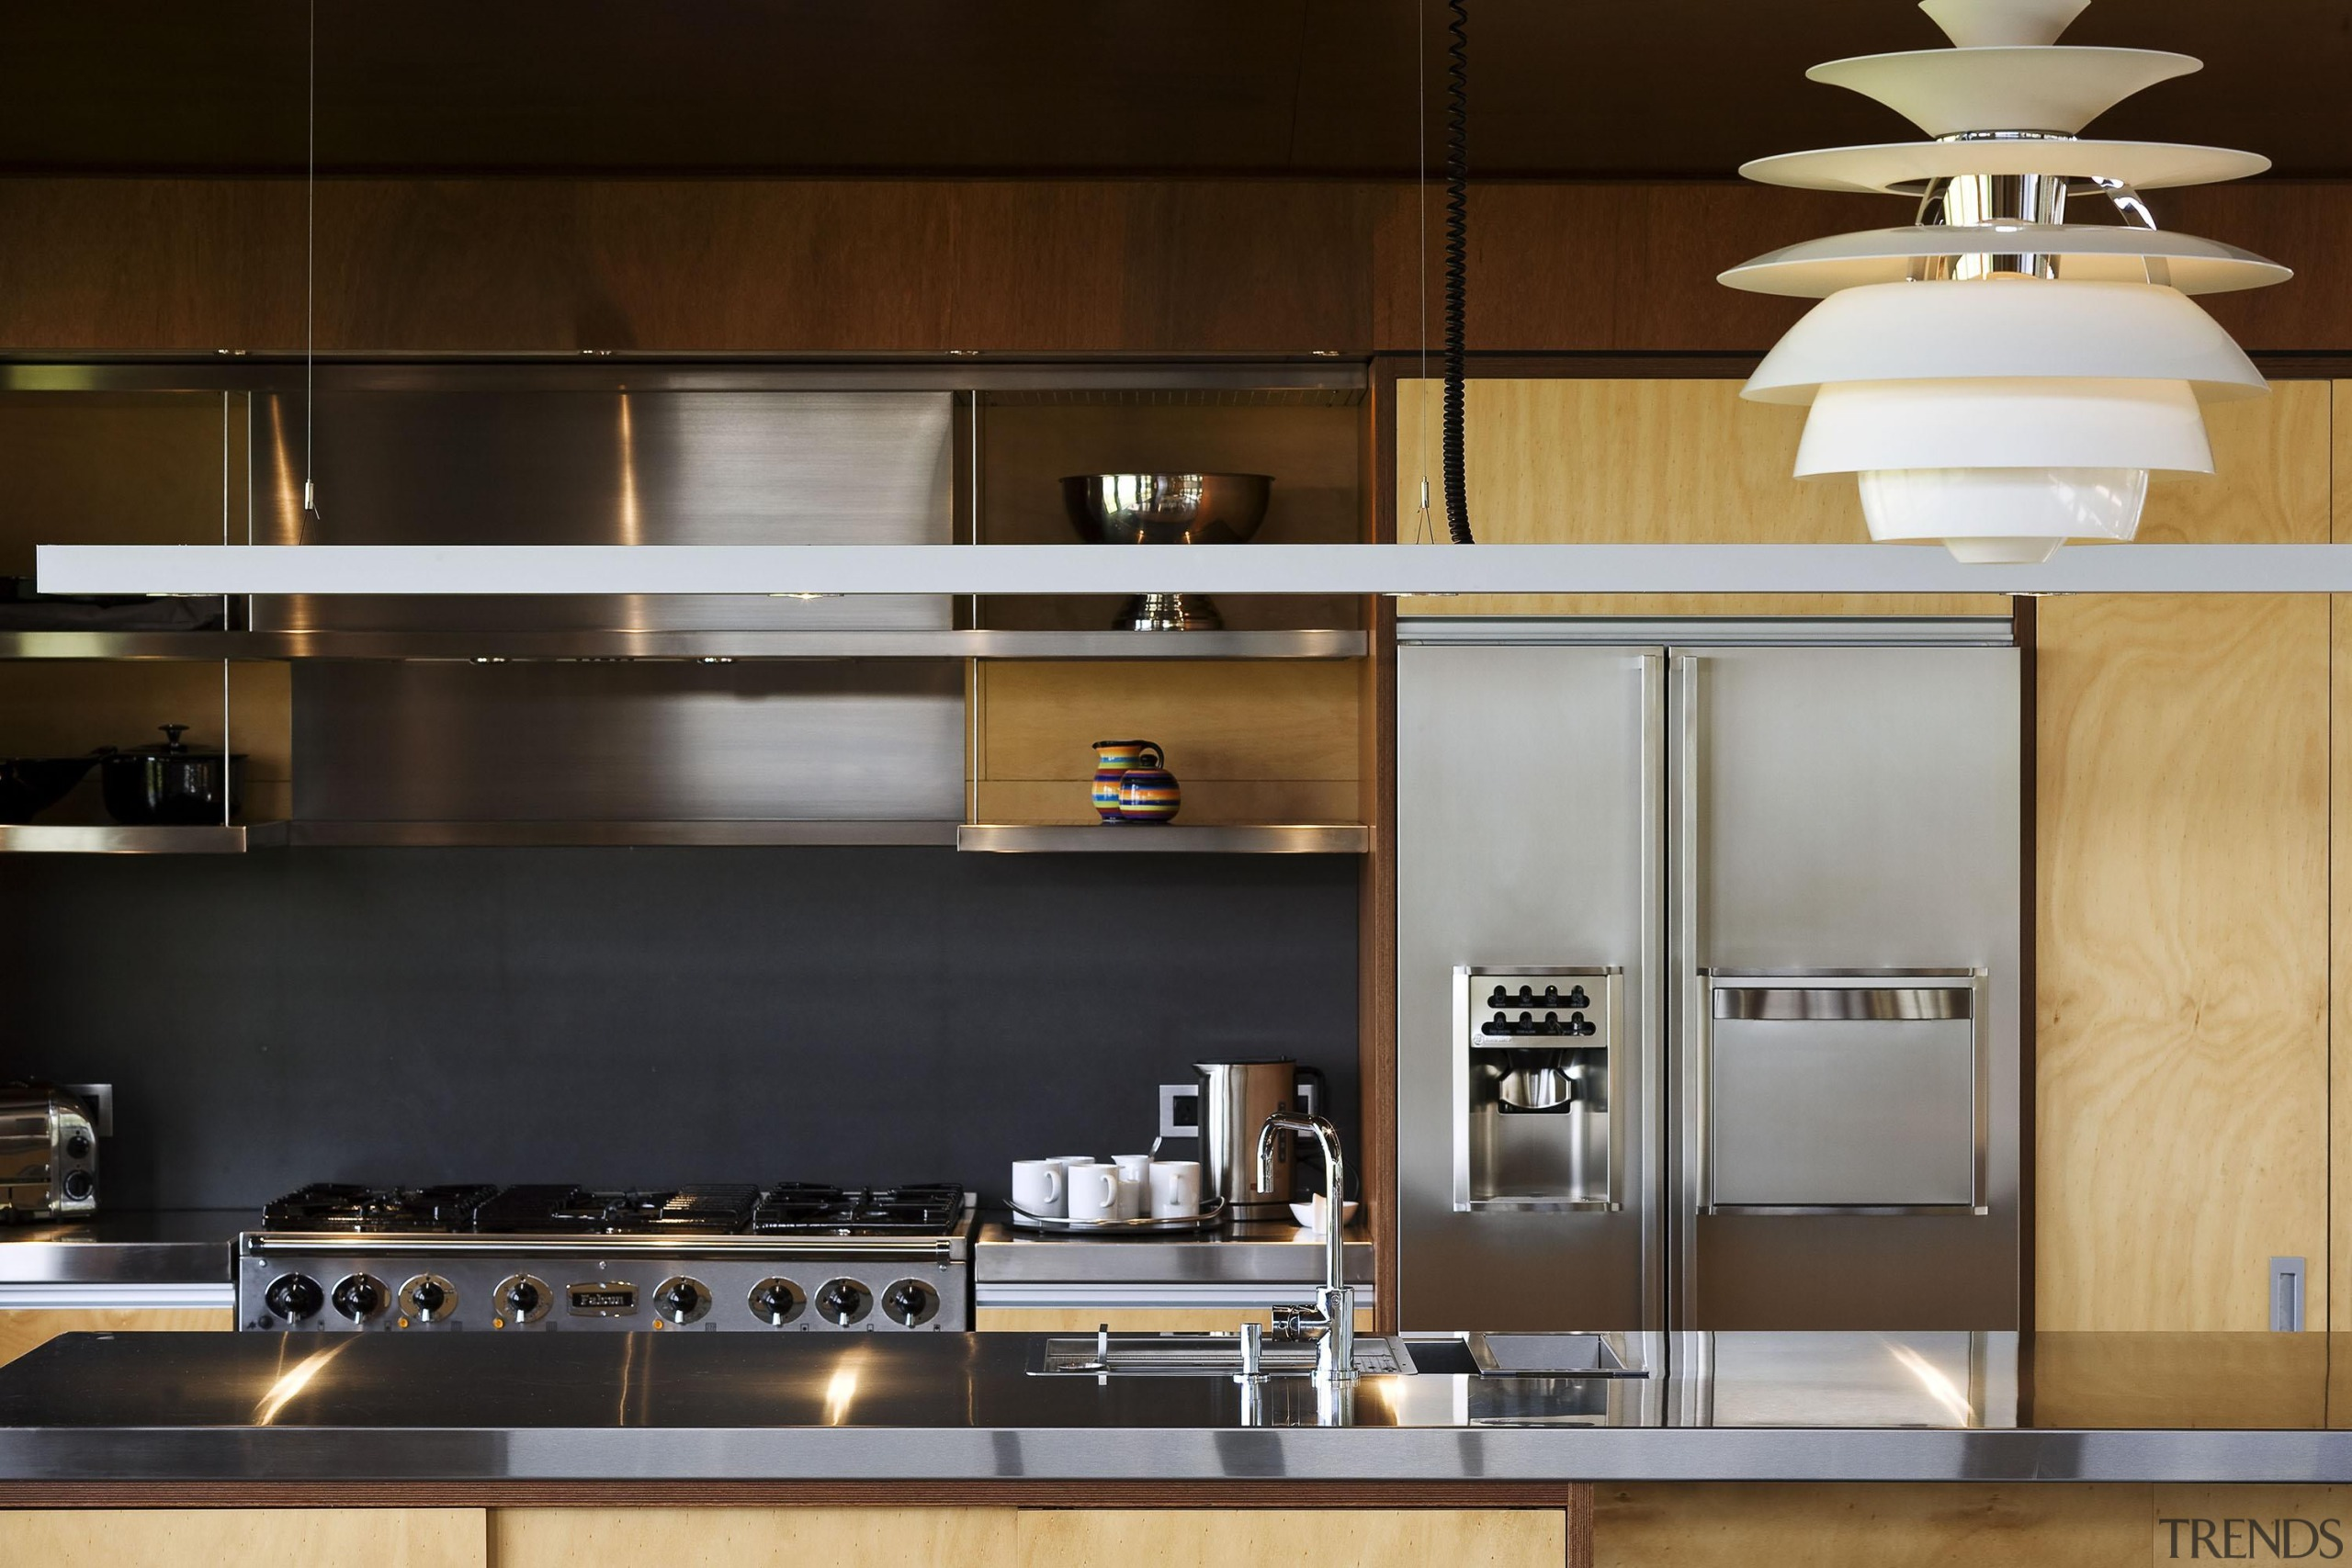 Waiheke Island, Auckland - Owhanake Bay - countertop countertop, cuisine classique, interior design, kitchen, under cabinet lighting, brown, black